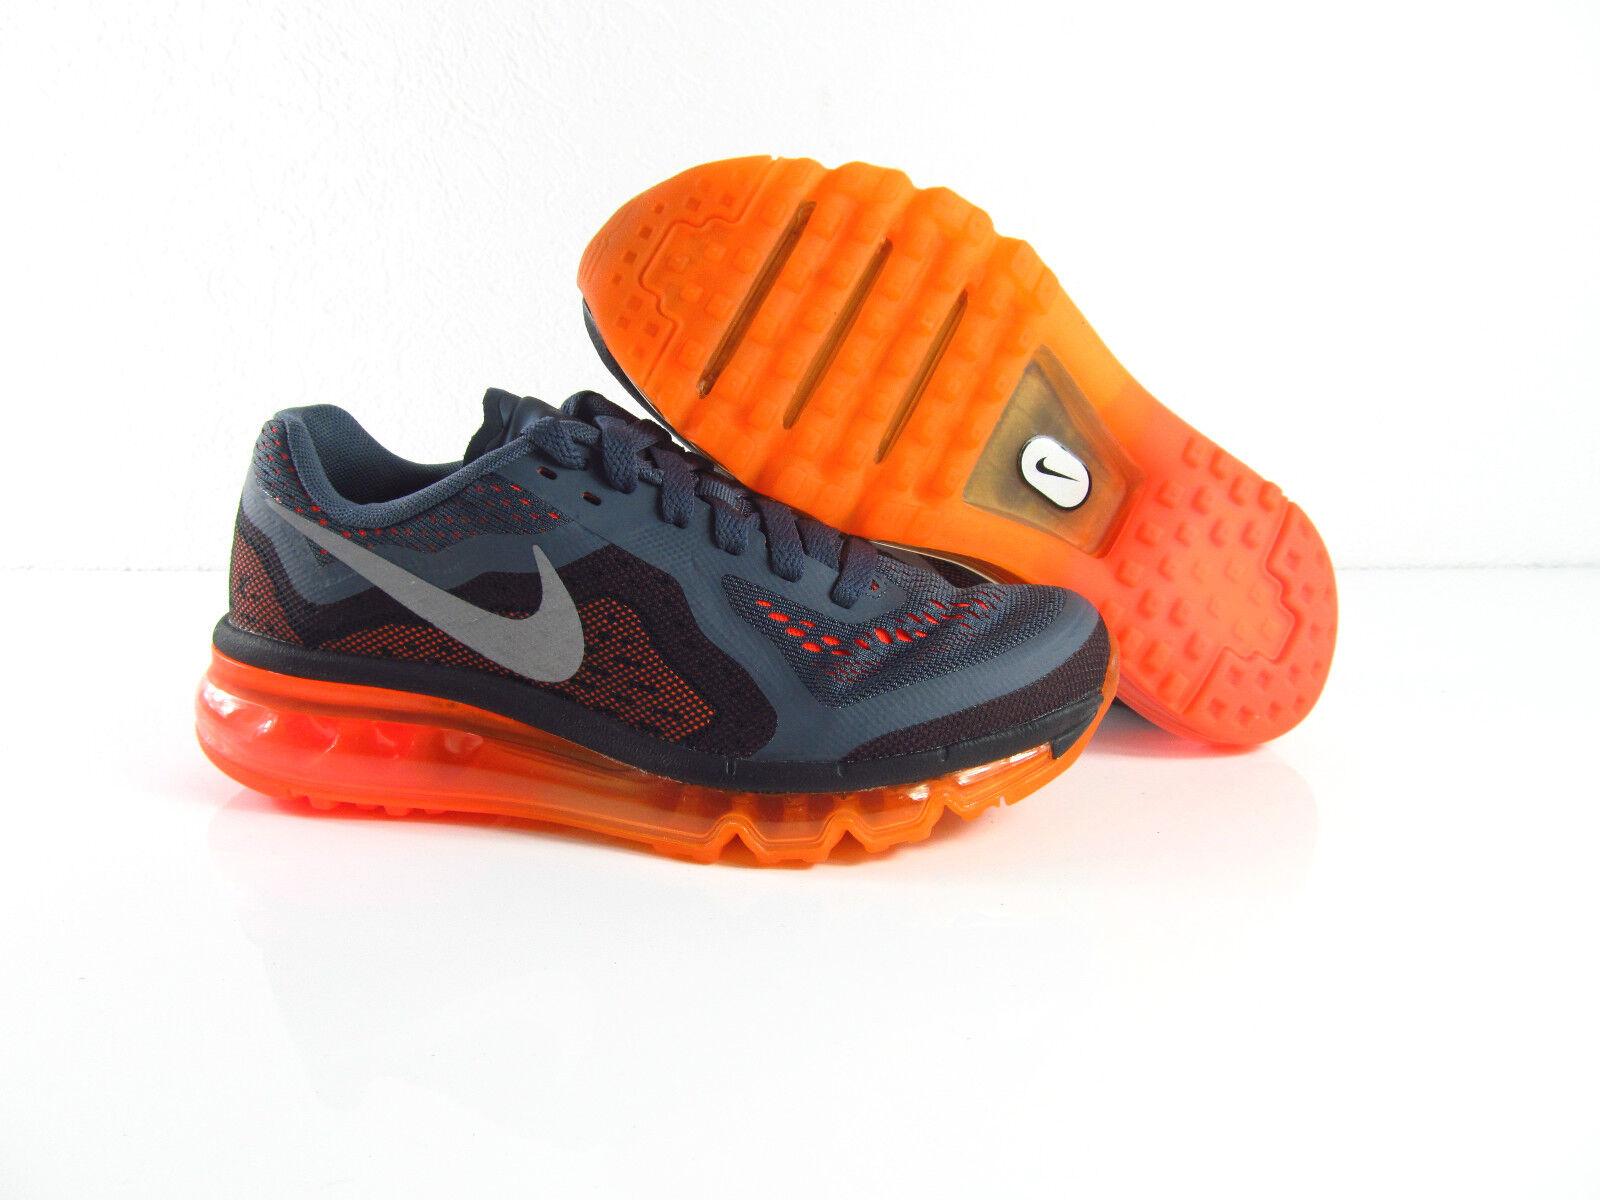 Nike Air Max 2014 1 87 90 Dark Magnet Grey Hyper Running US_6 11 Eur_35.5 36 38